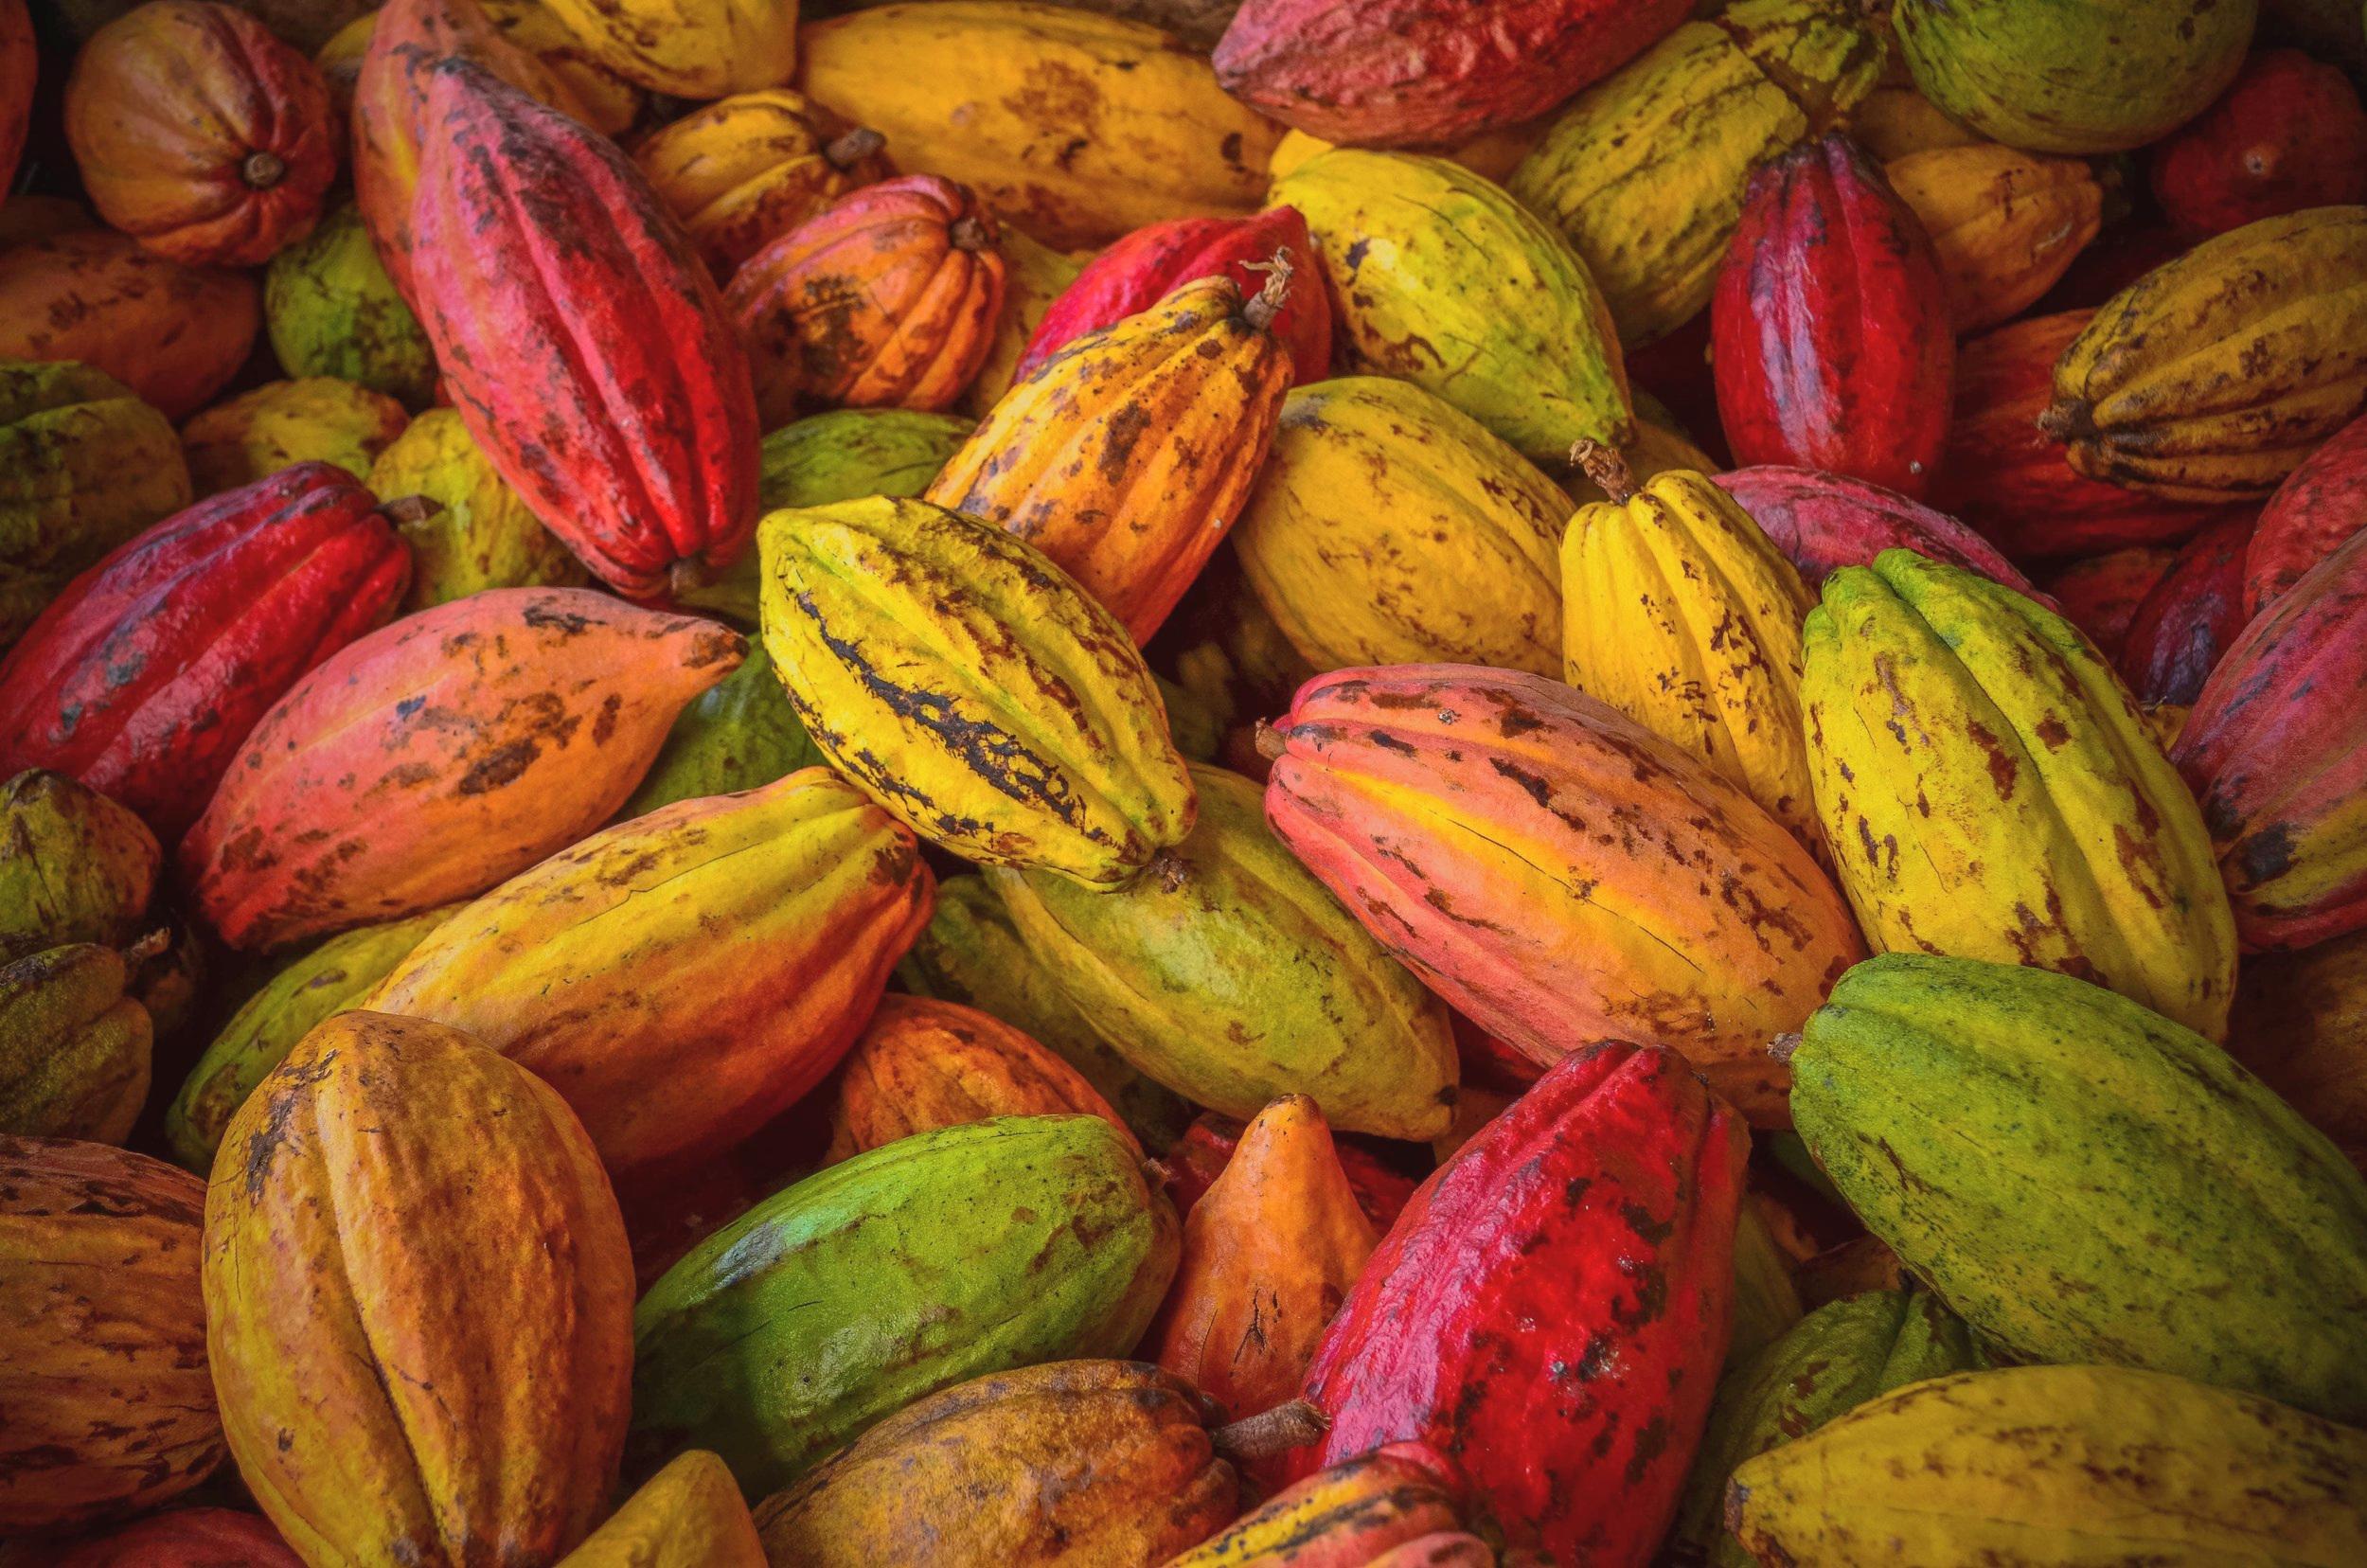 granos-cacao-superalimentos-mexicanos